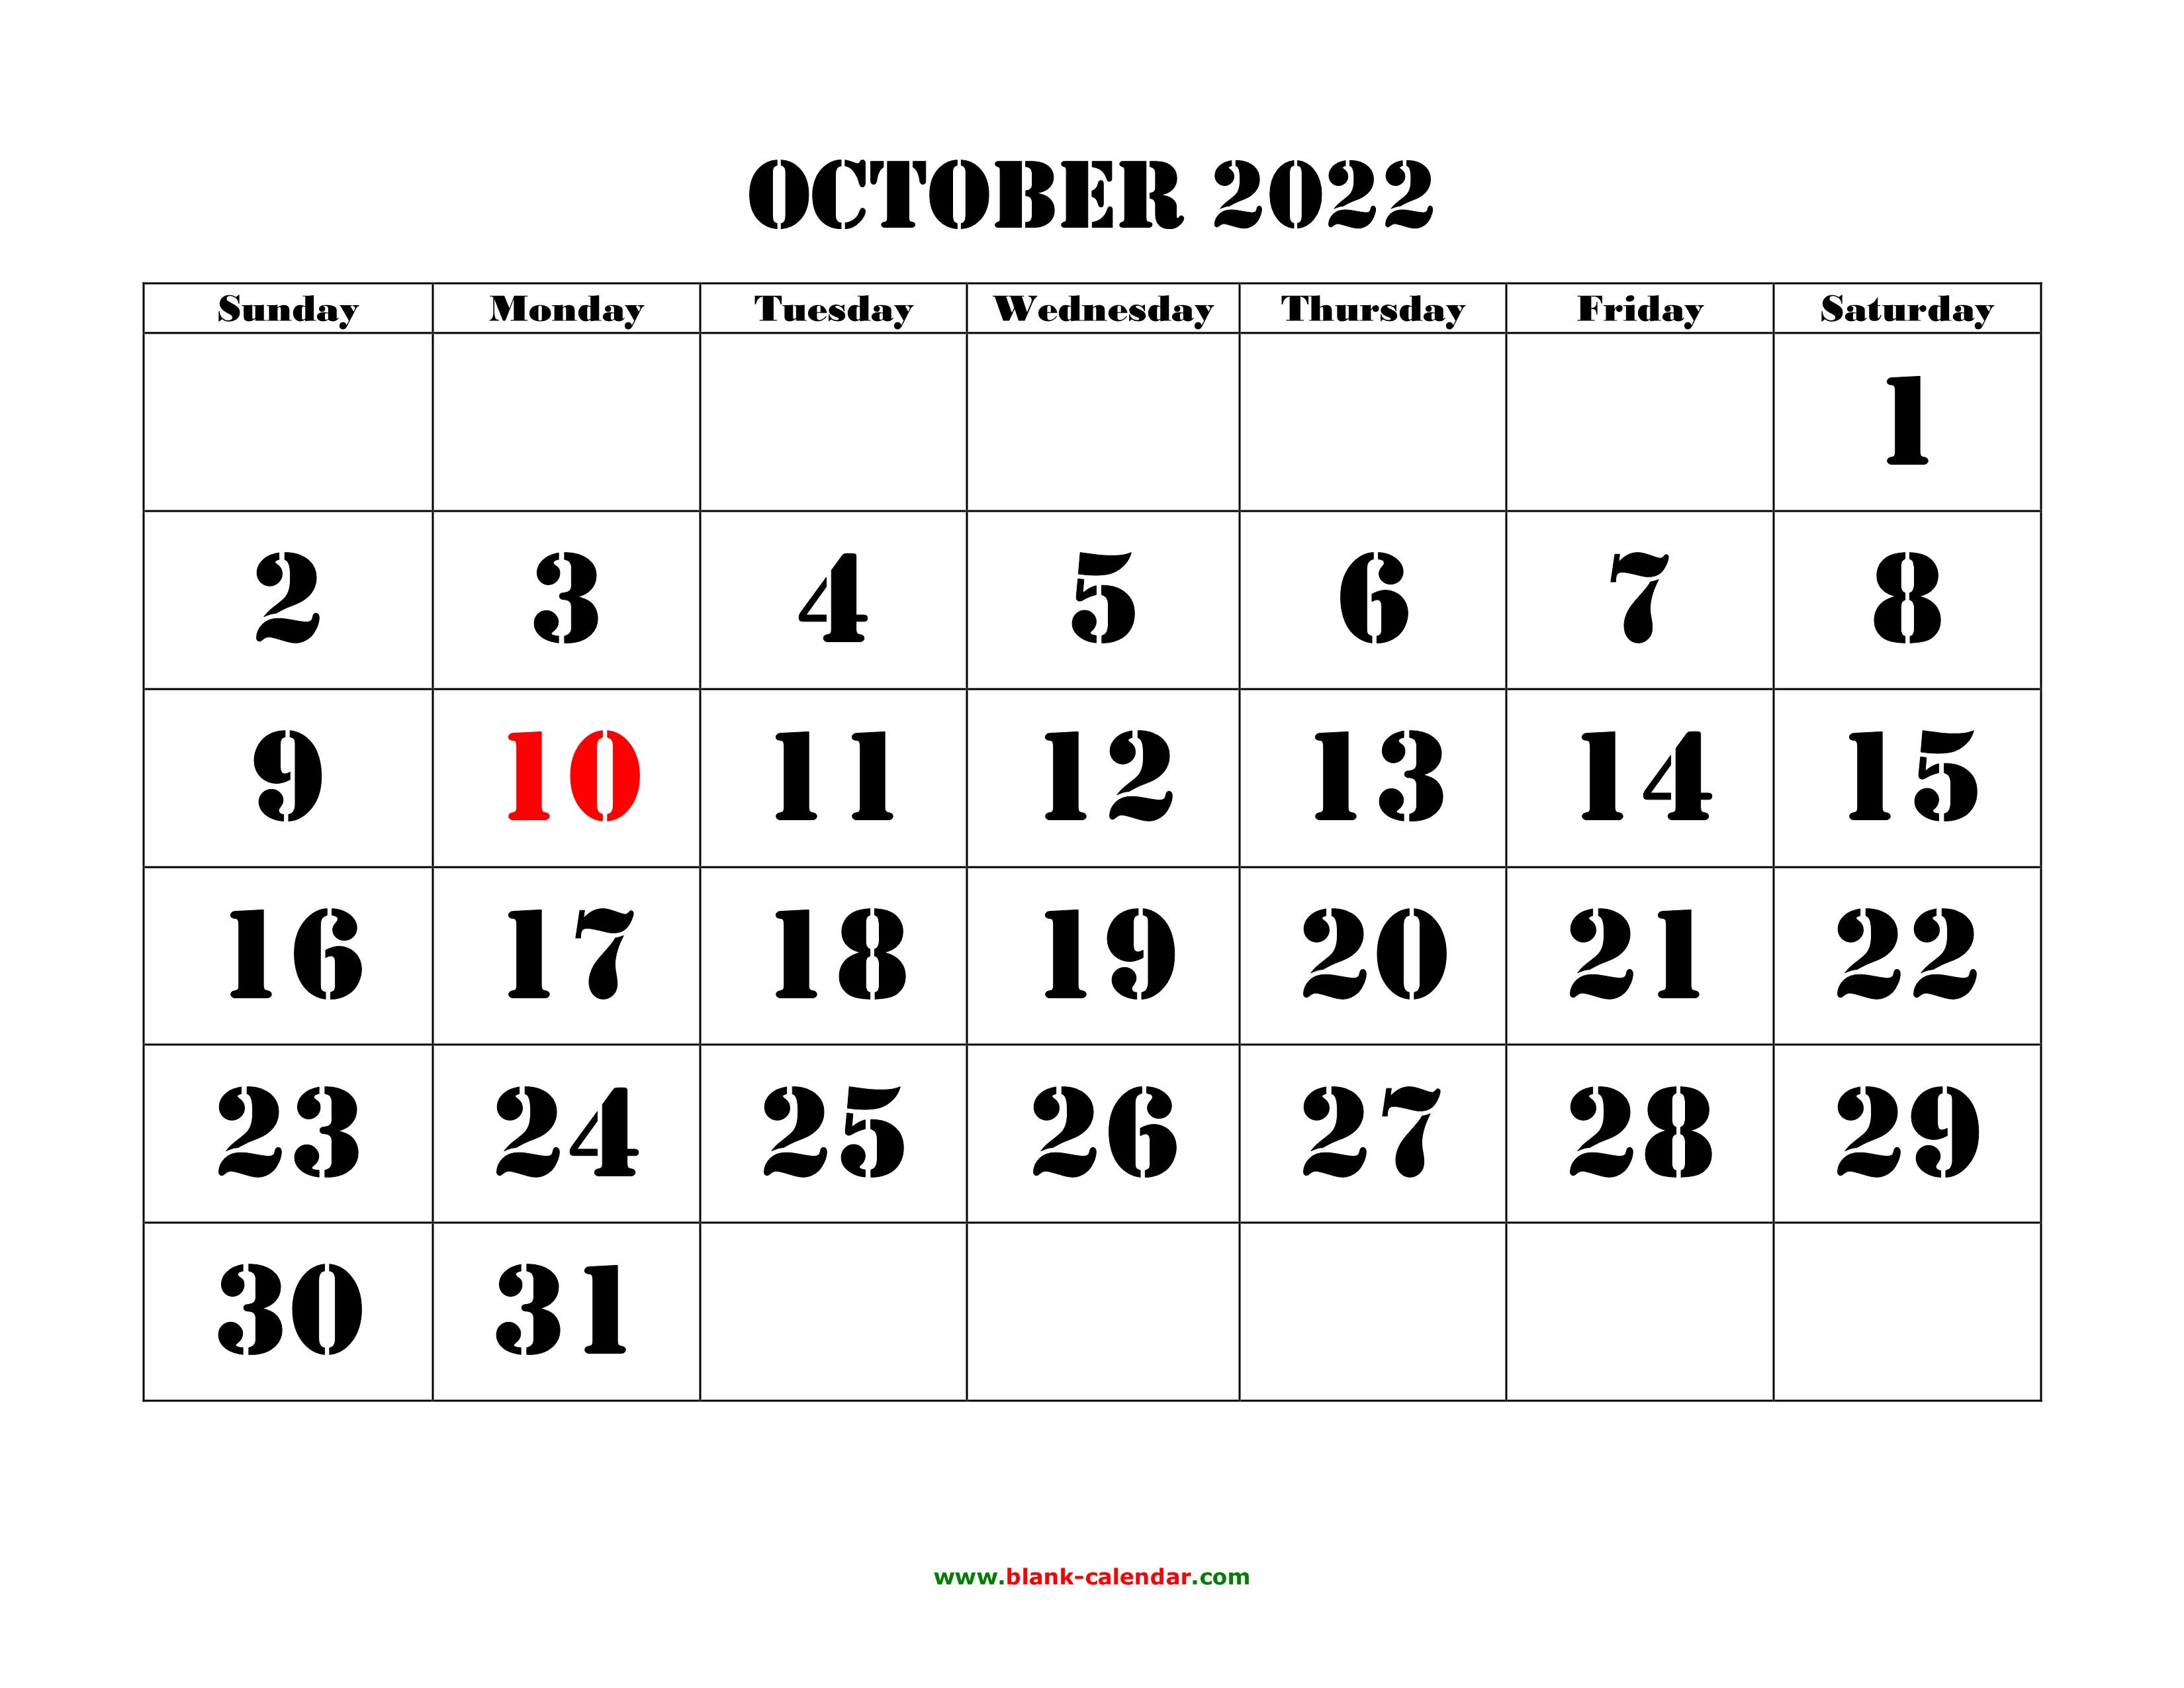 Oct 2022 Calendar With Holidays.Free Download Printable October 2022 Calendar Large Font Design Holidays On Red